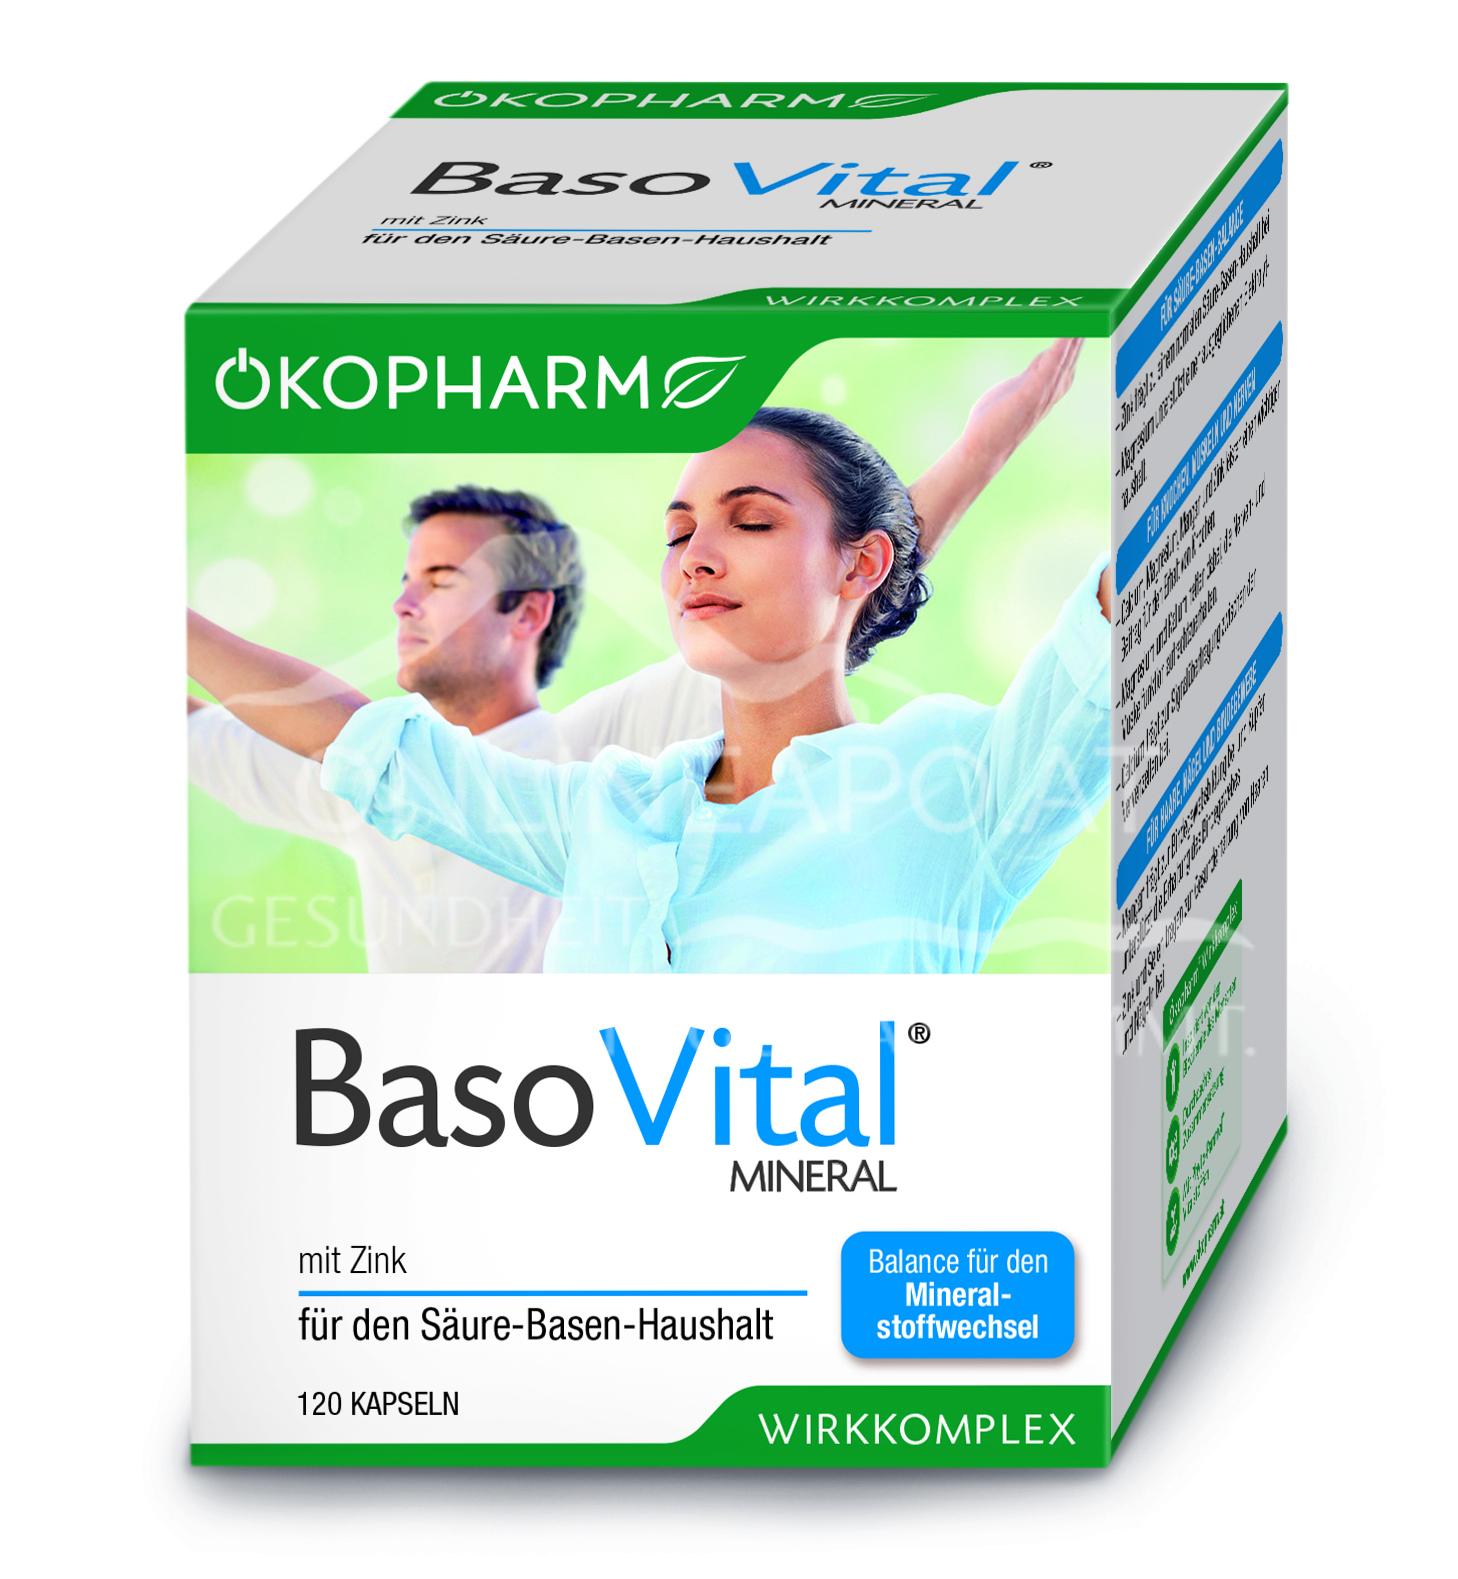 Ökopharm BasoVital® Mineral Kapseln